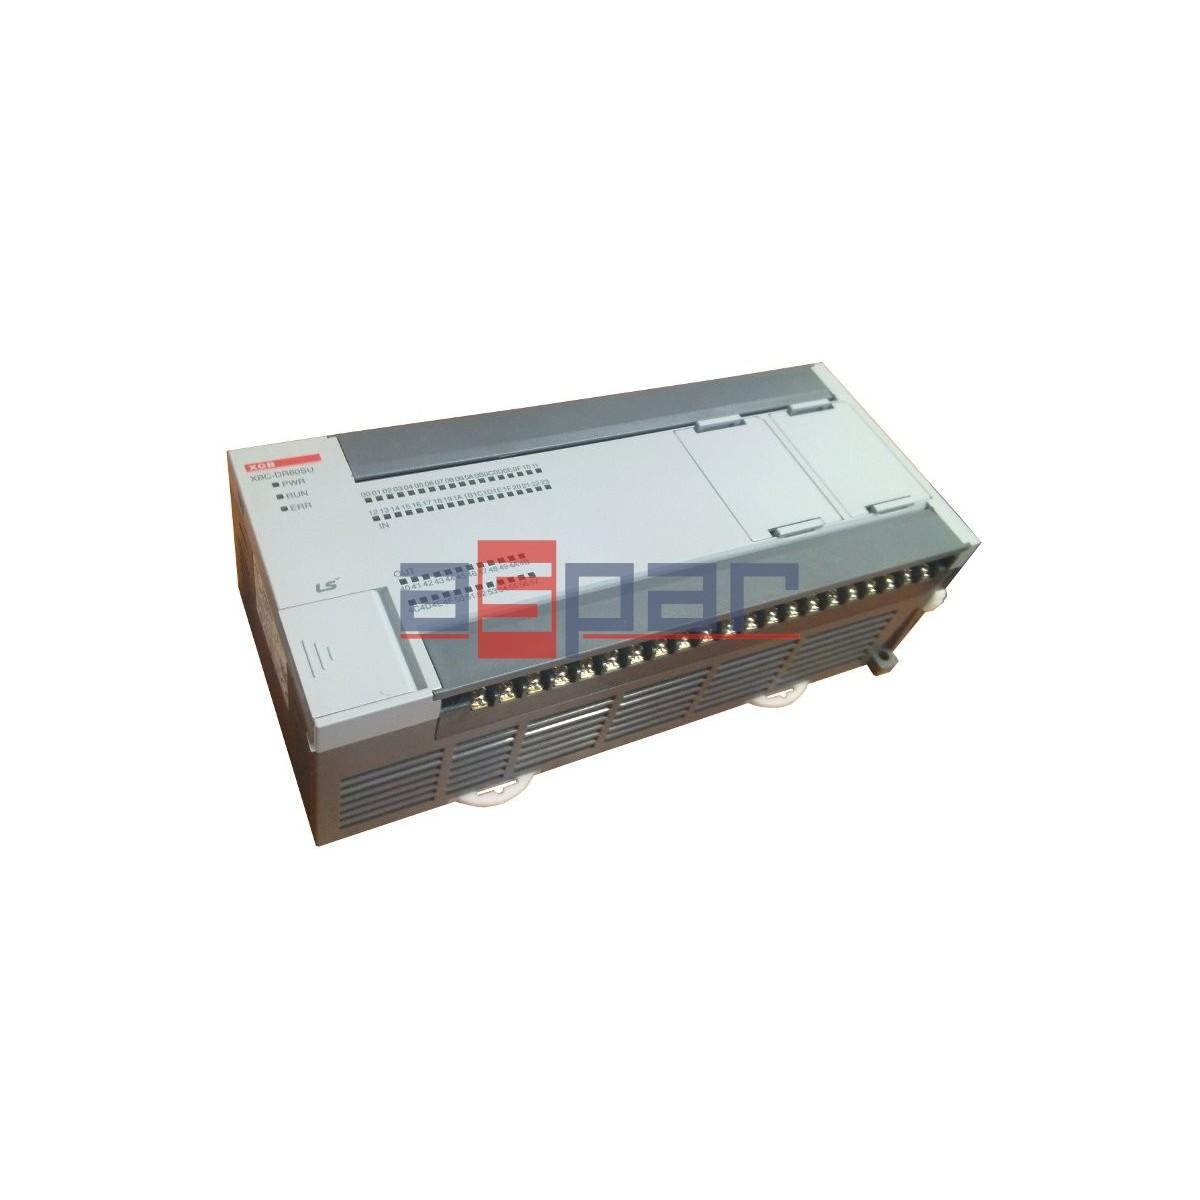 XBC-DR60SU - CPU 36 I/24 O przekaźnik